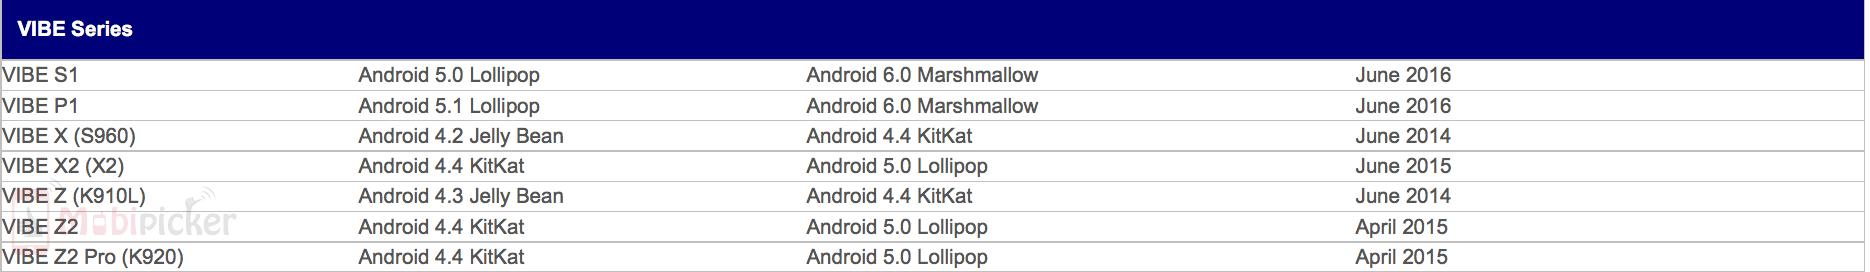 Marshmallow Update - Lenovo K3 Note, A7000, Vibe S1, P1 | MobiPicker